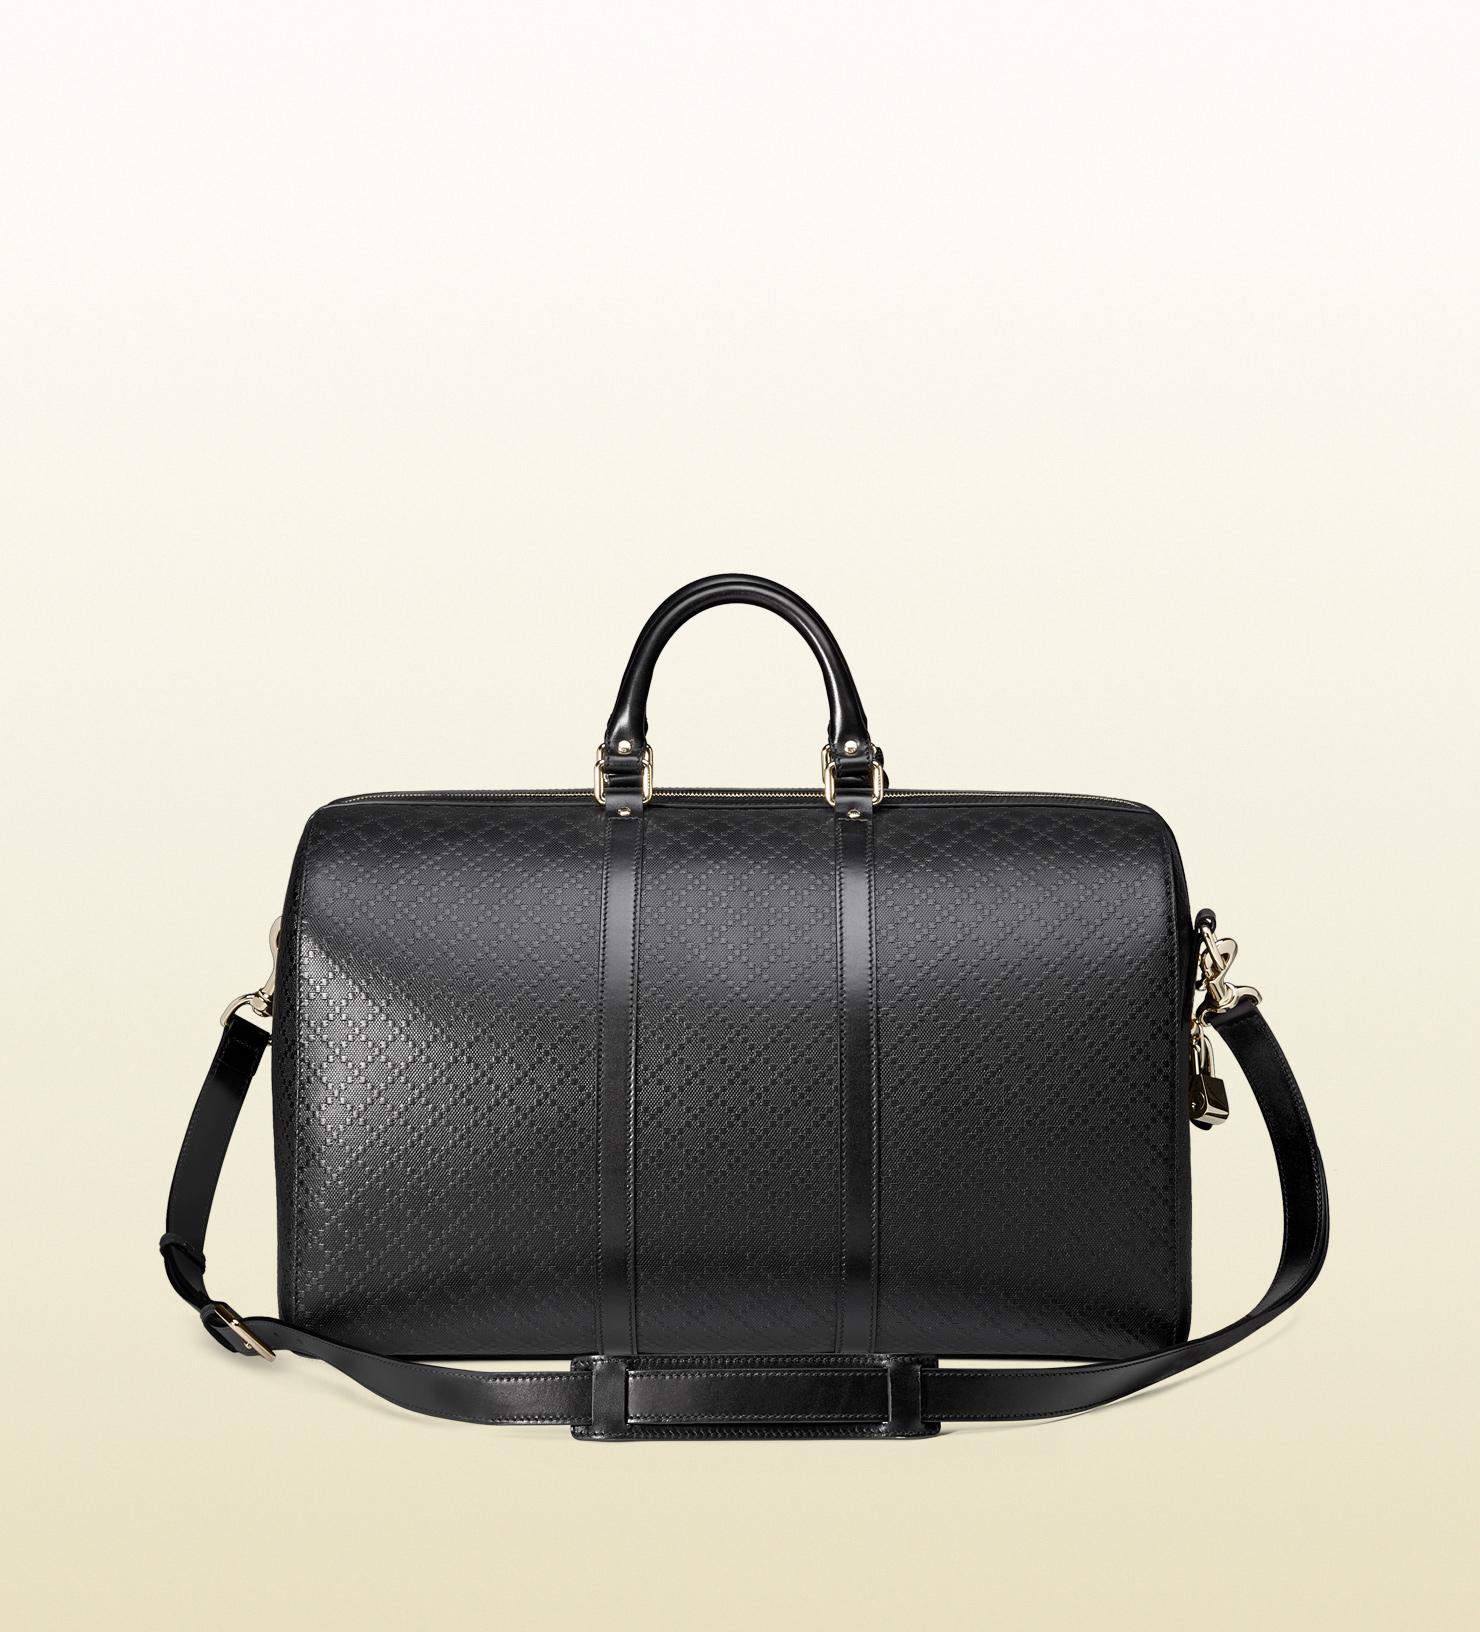 2d656fea047 Lyst - Gucci Bright Diamante Leather Medium Duffel in Black for Men